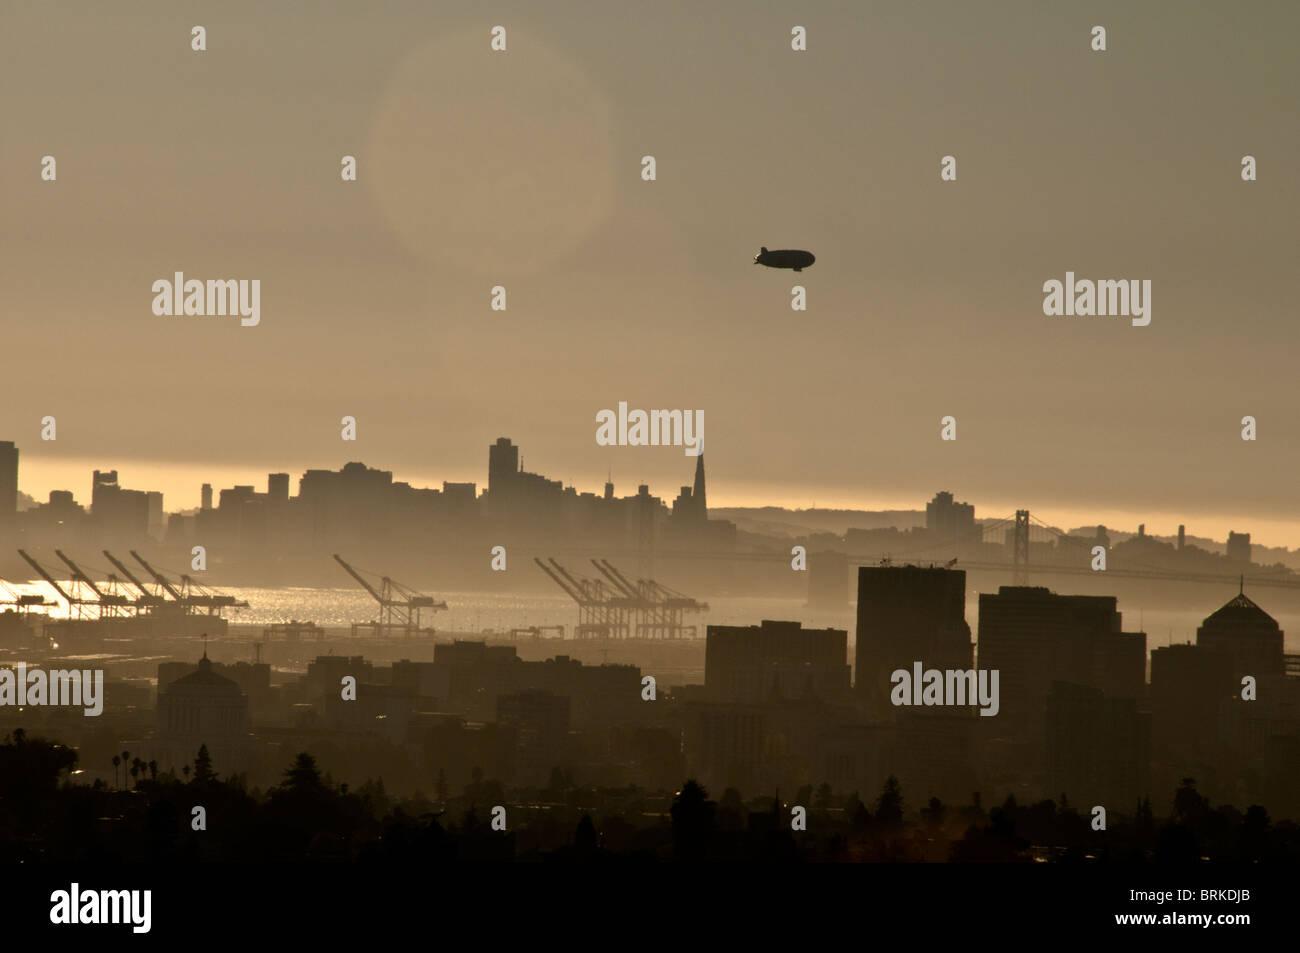 Blimp over San Francisco - Stock Image